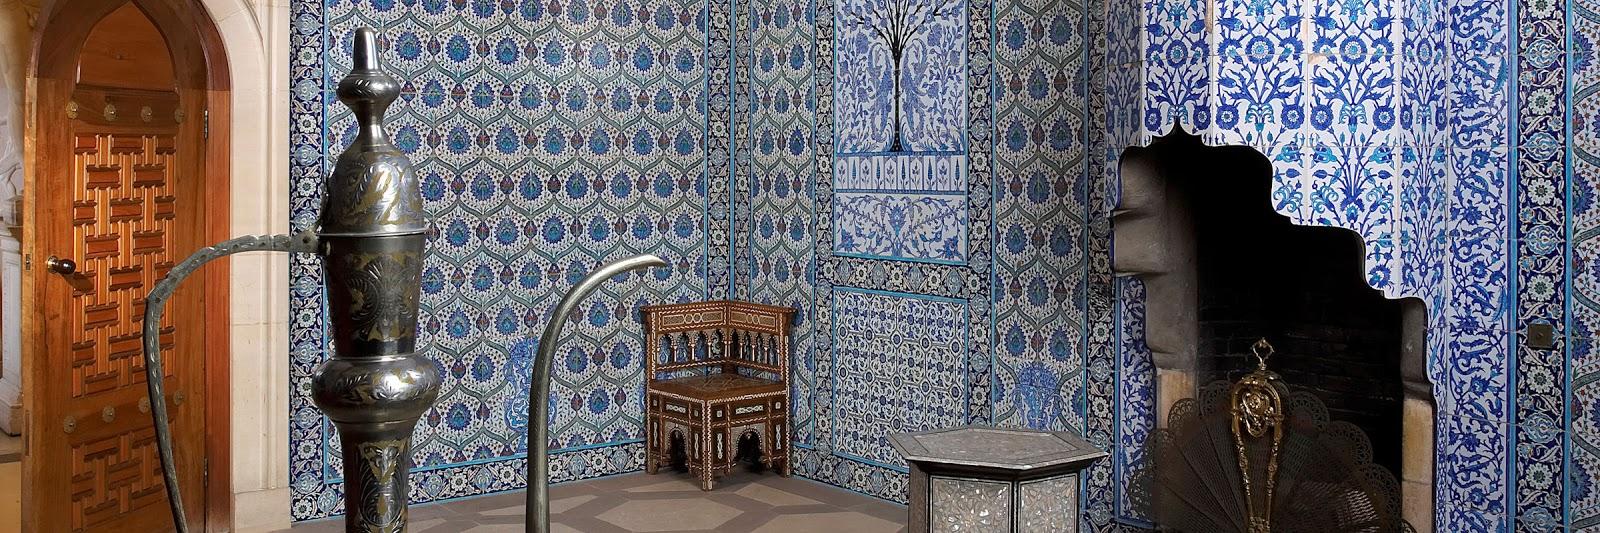 Mavi boncuk the turkish room at sledmere house yorkshire designed for sir mark sykes1 6th baronet by an armenian artist david ohanessian